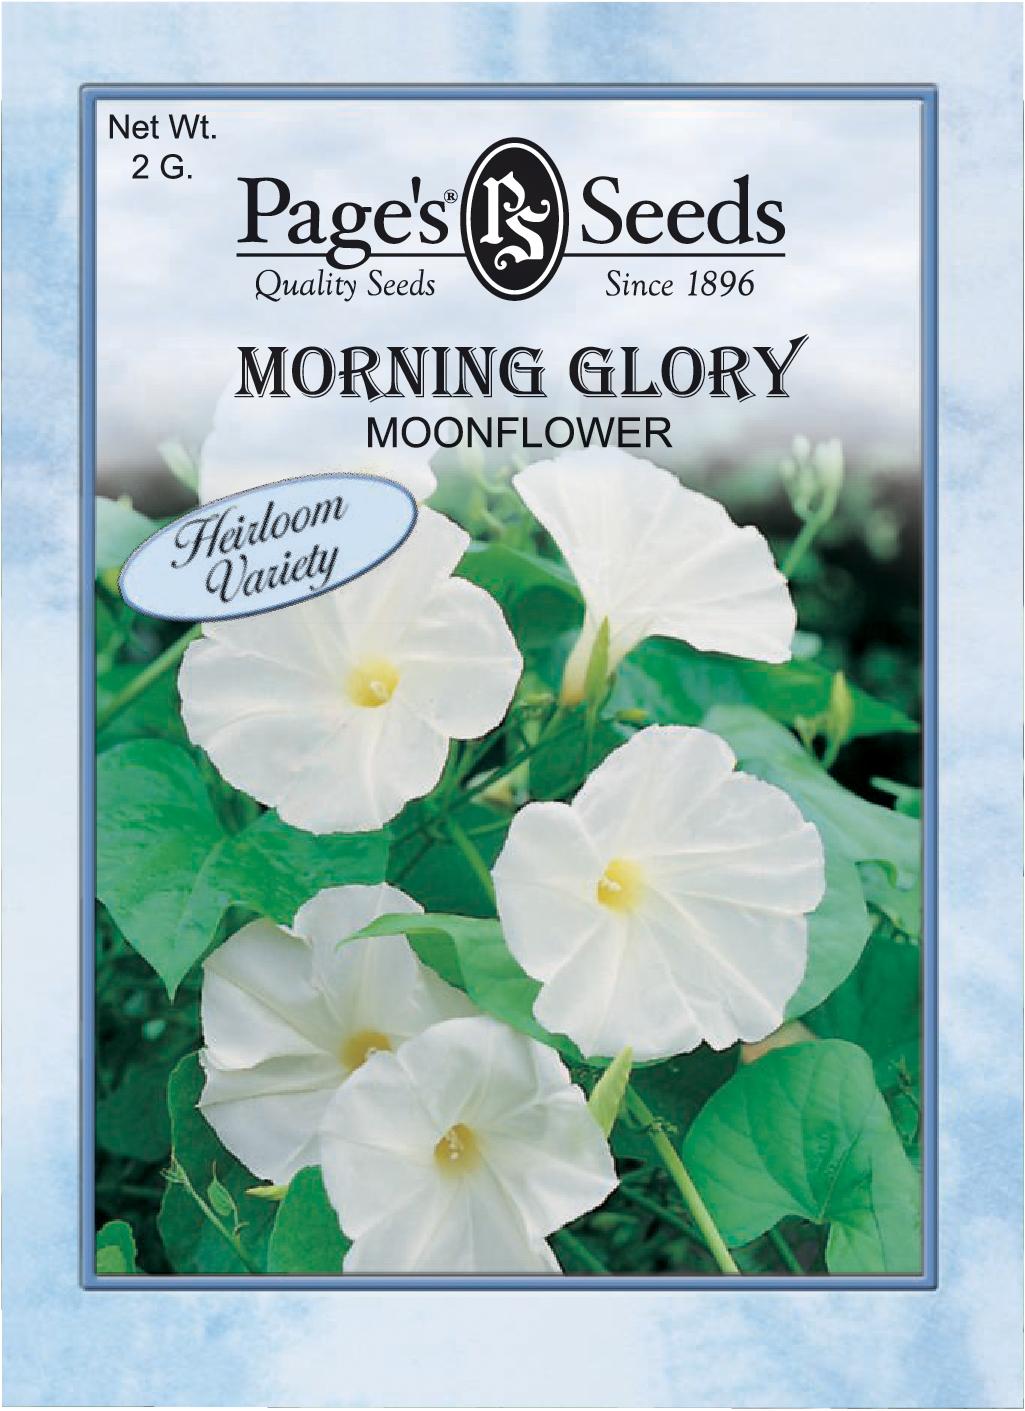 Morning Glory Moonflower